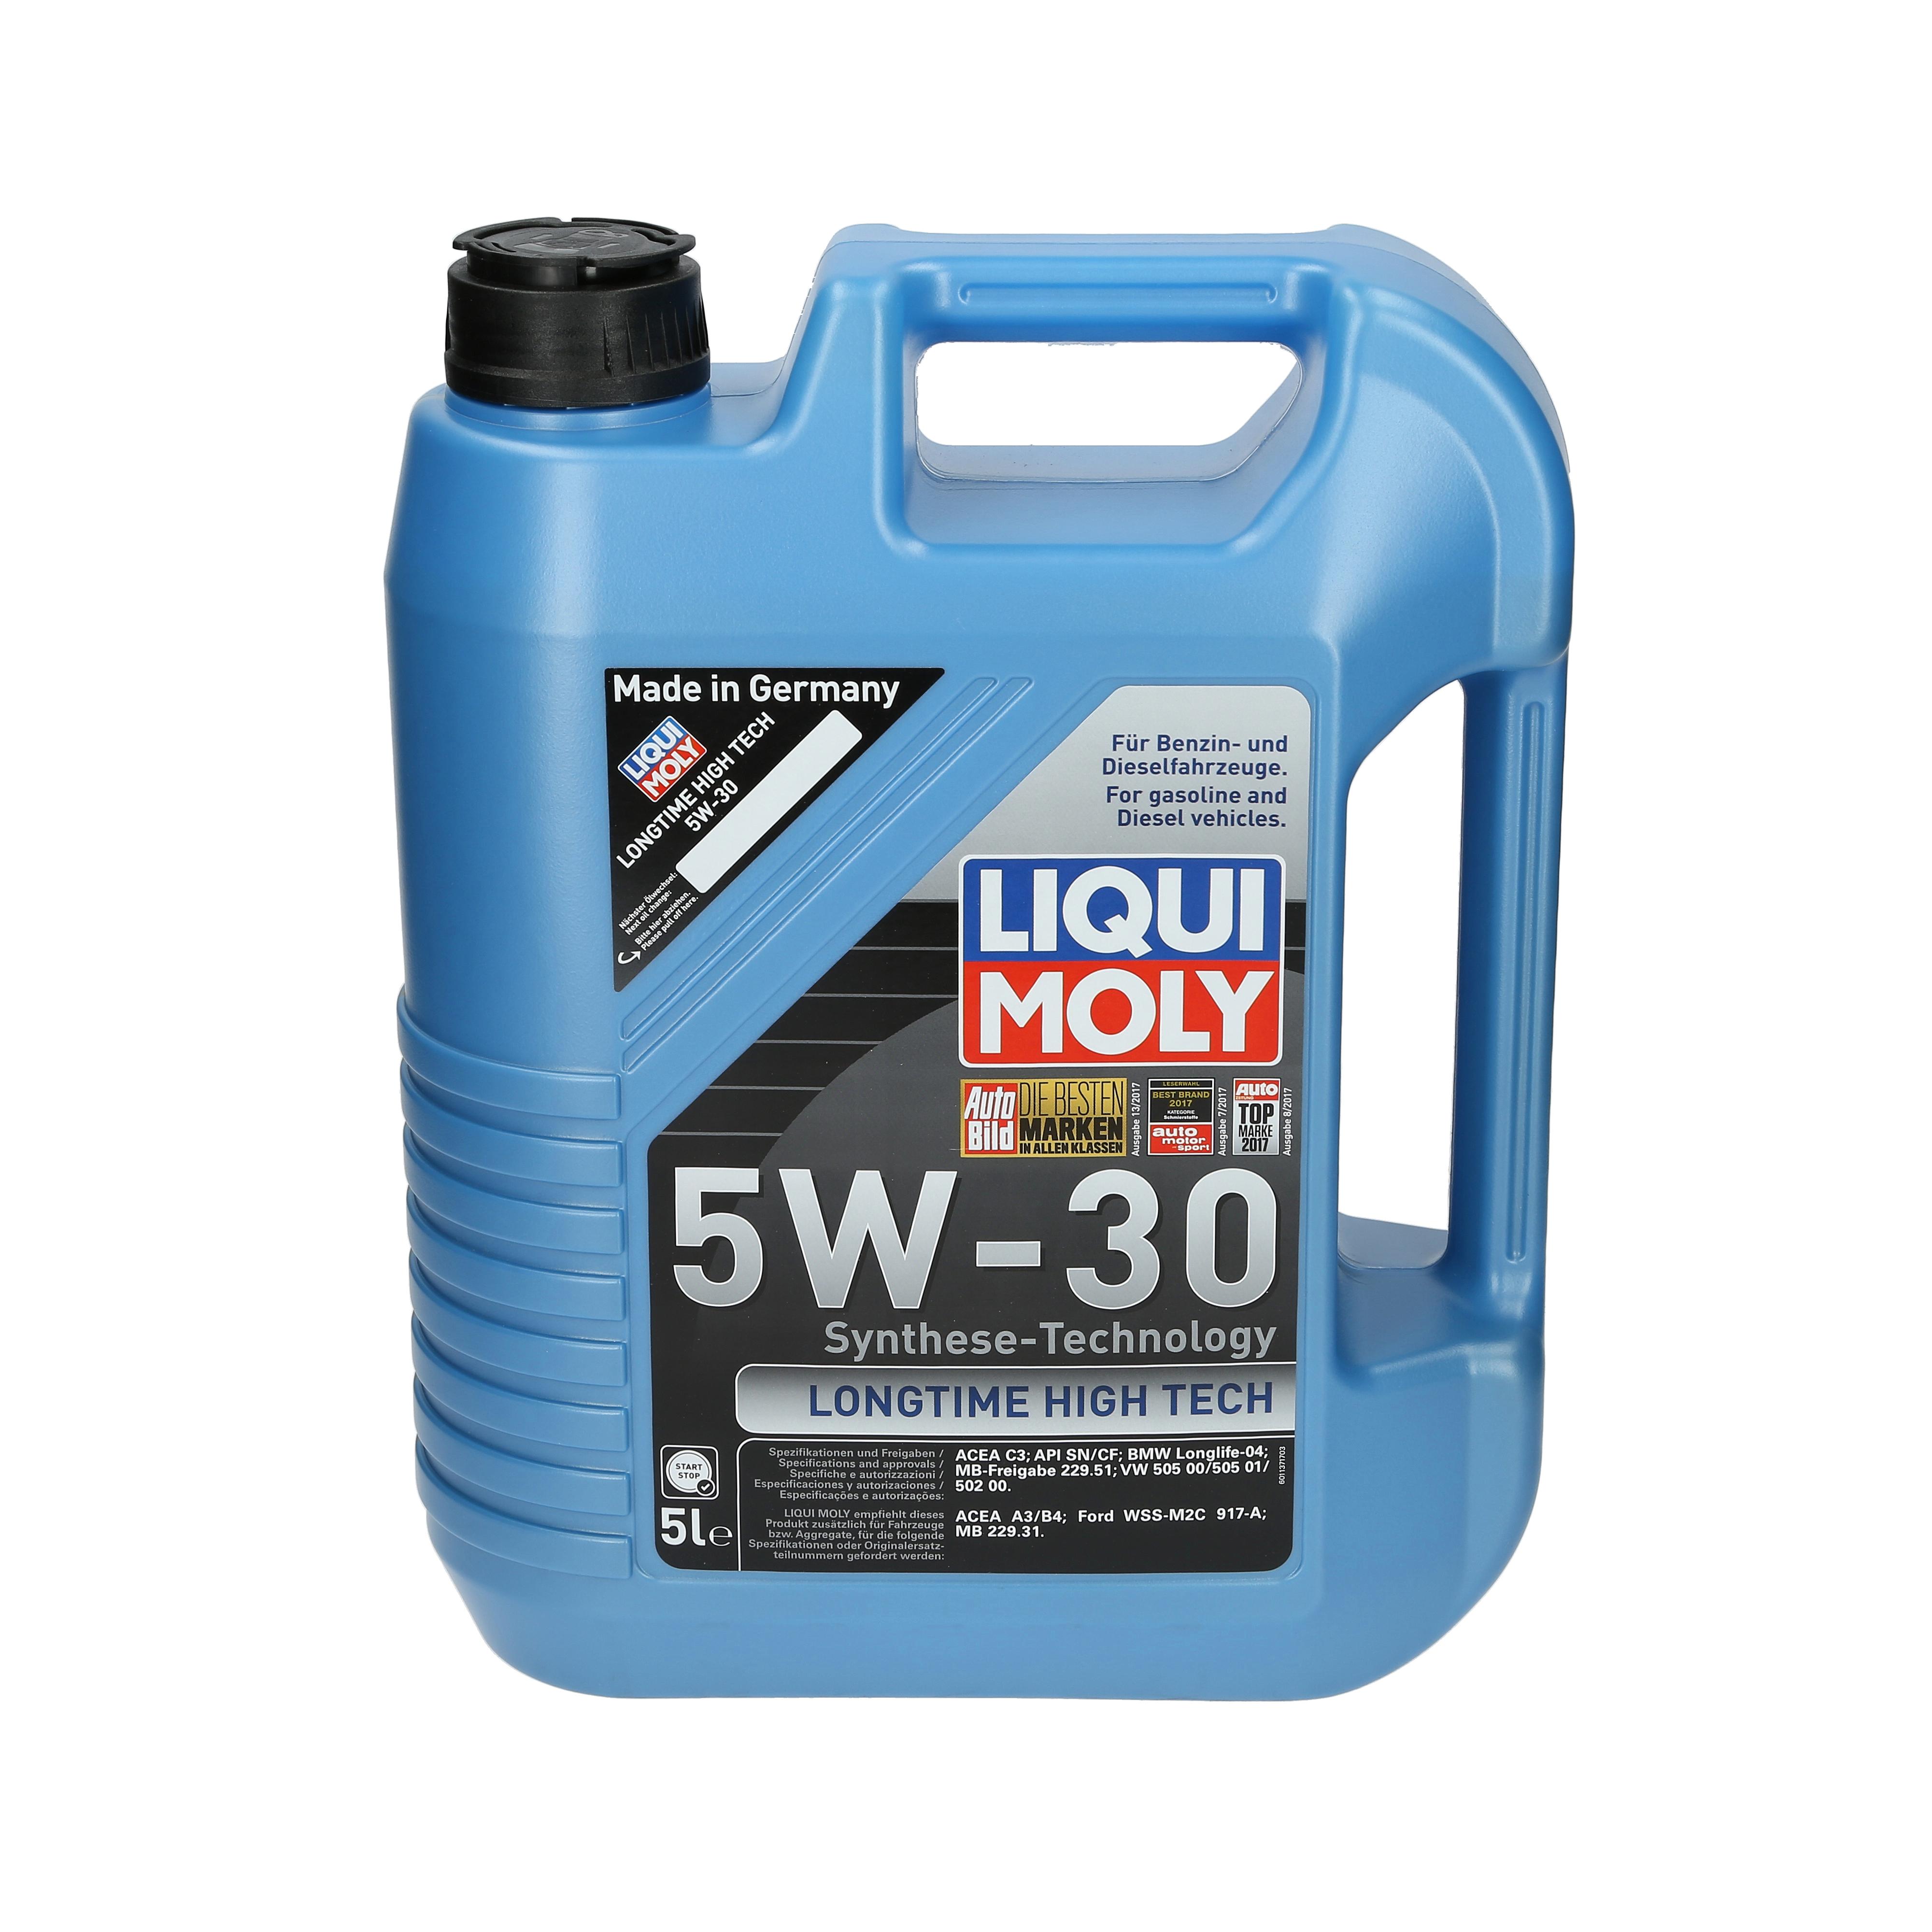 Motoröl ´Longtime High Tech 5W-30´ | LIQUI MOLY (1137)